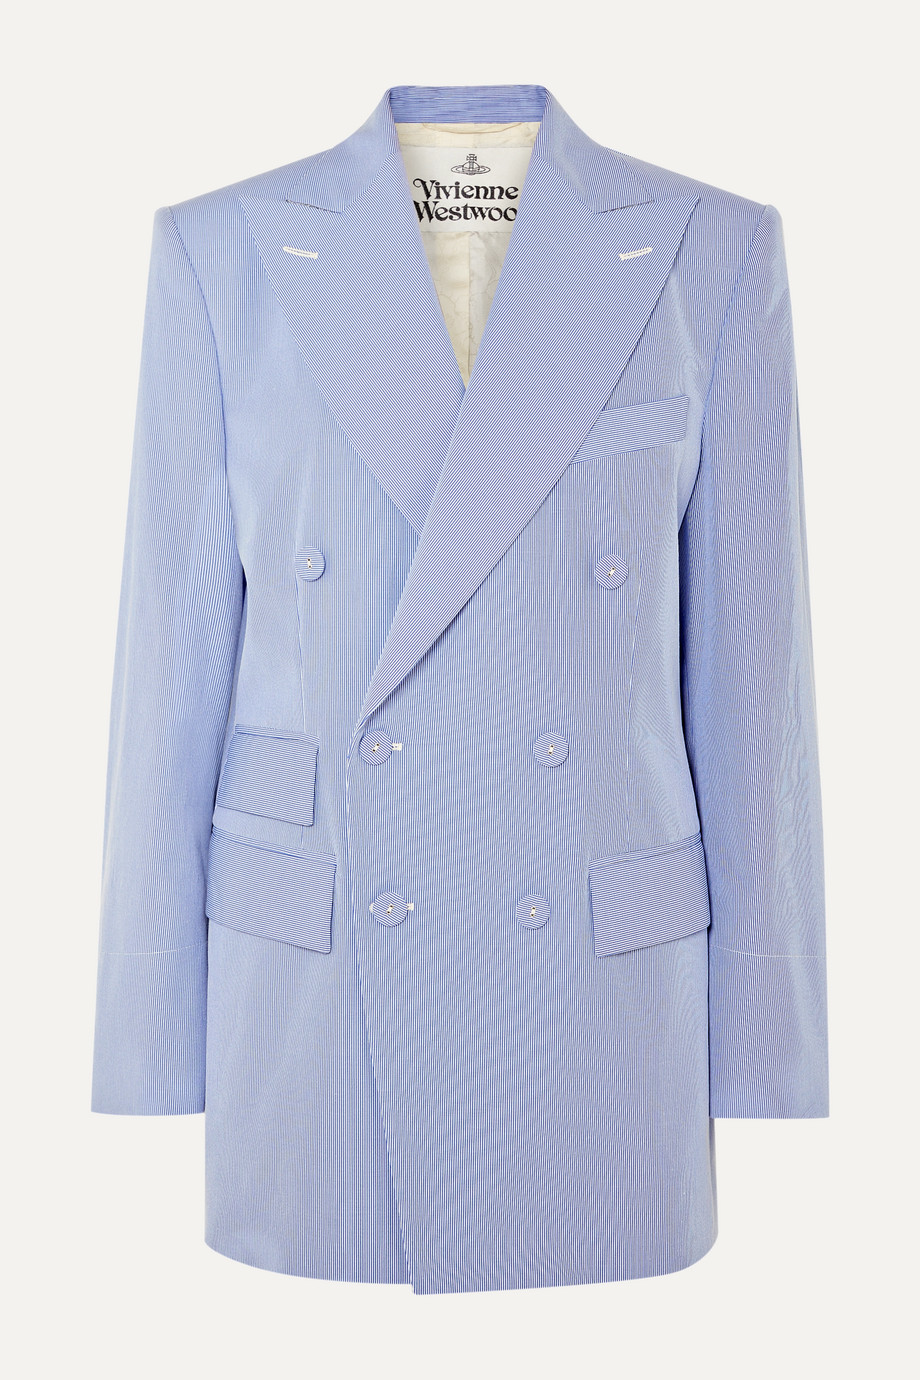 Vivienne Westwood 大廓形双排扣细条纹棉质混纺西装外套